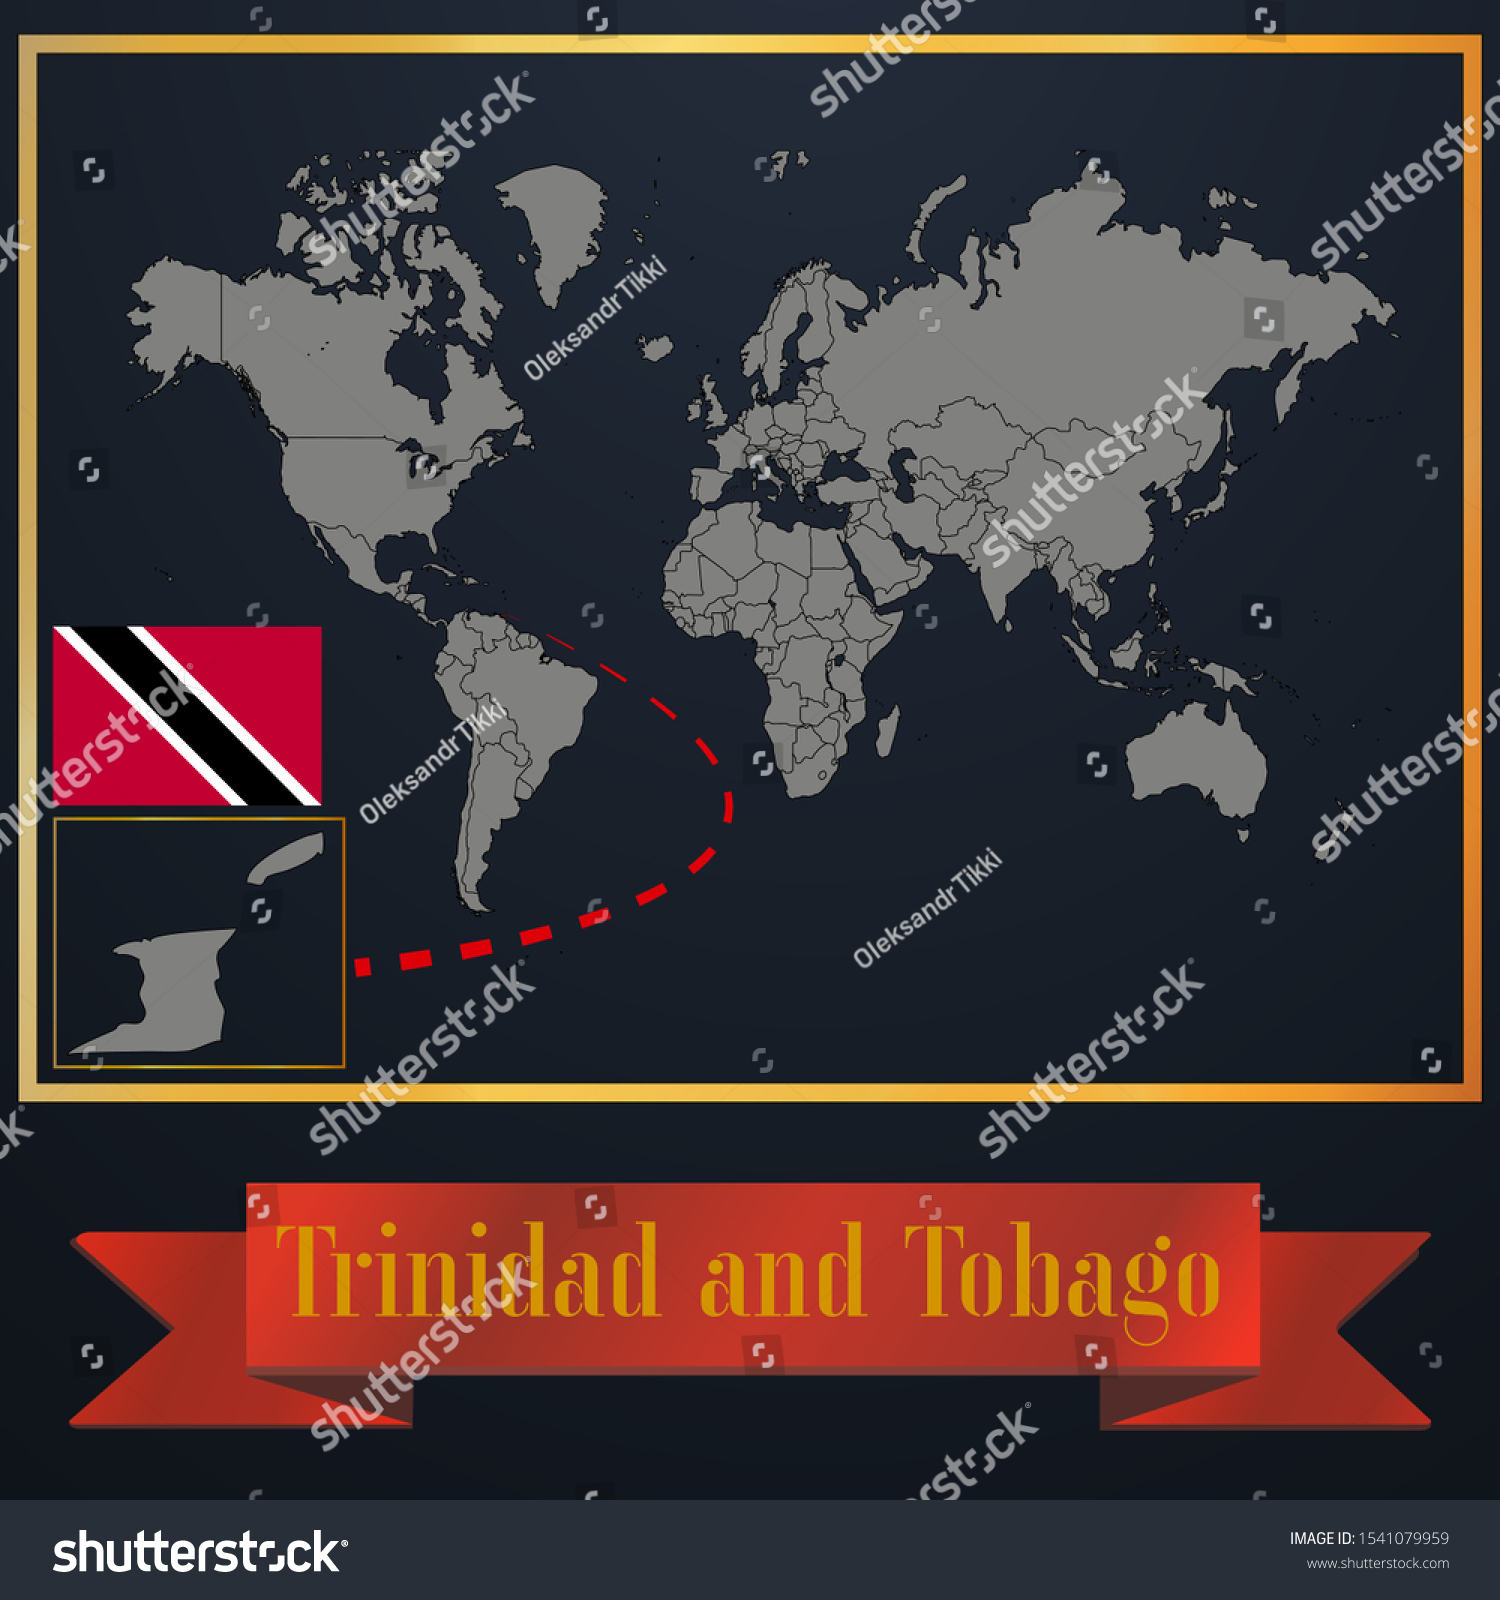 Picture of: Vector De Stock Libre De Regalias Sobre Caribbean Trinidad Tobago National Flag Realistic1541079959